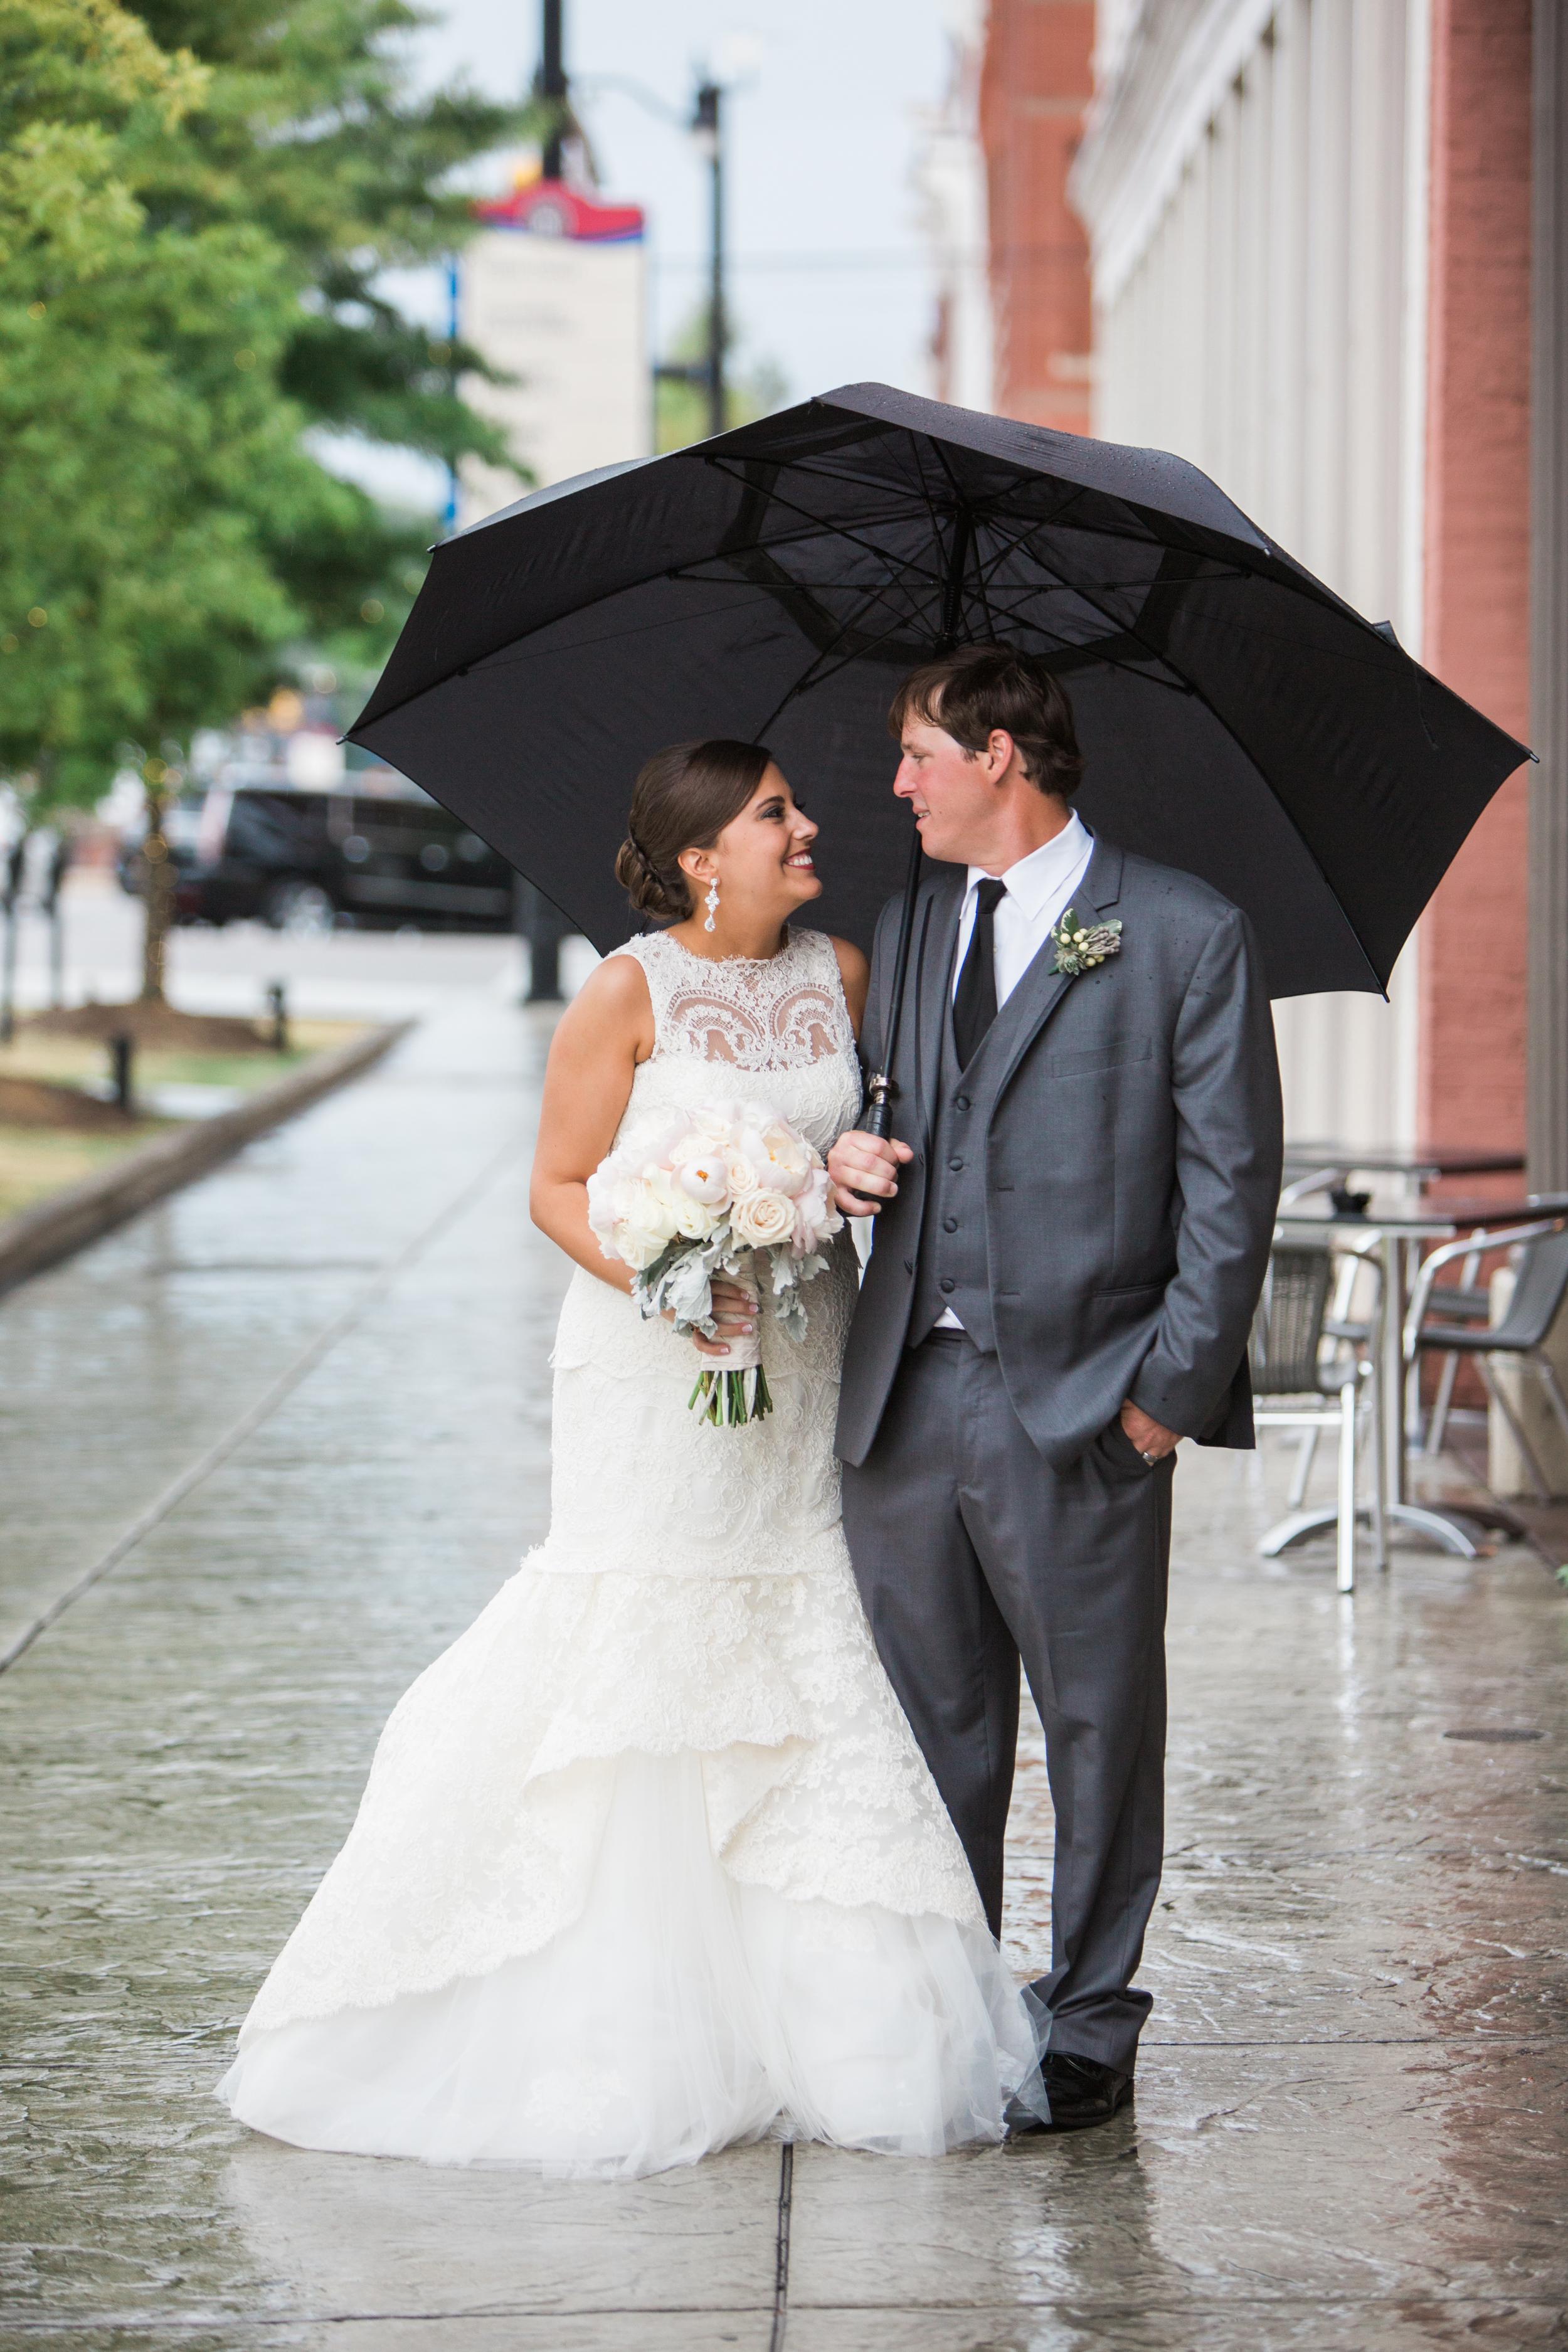 Alabama-Wedding-Photographers-Nick-Elizabeth-Drollette-128.jpg